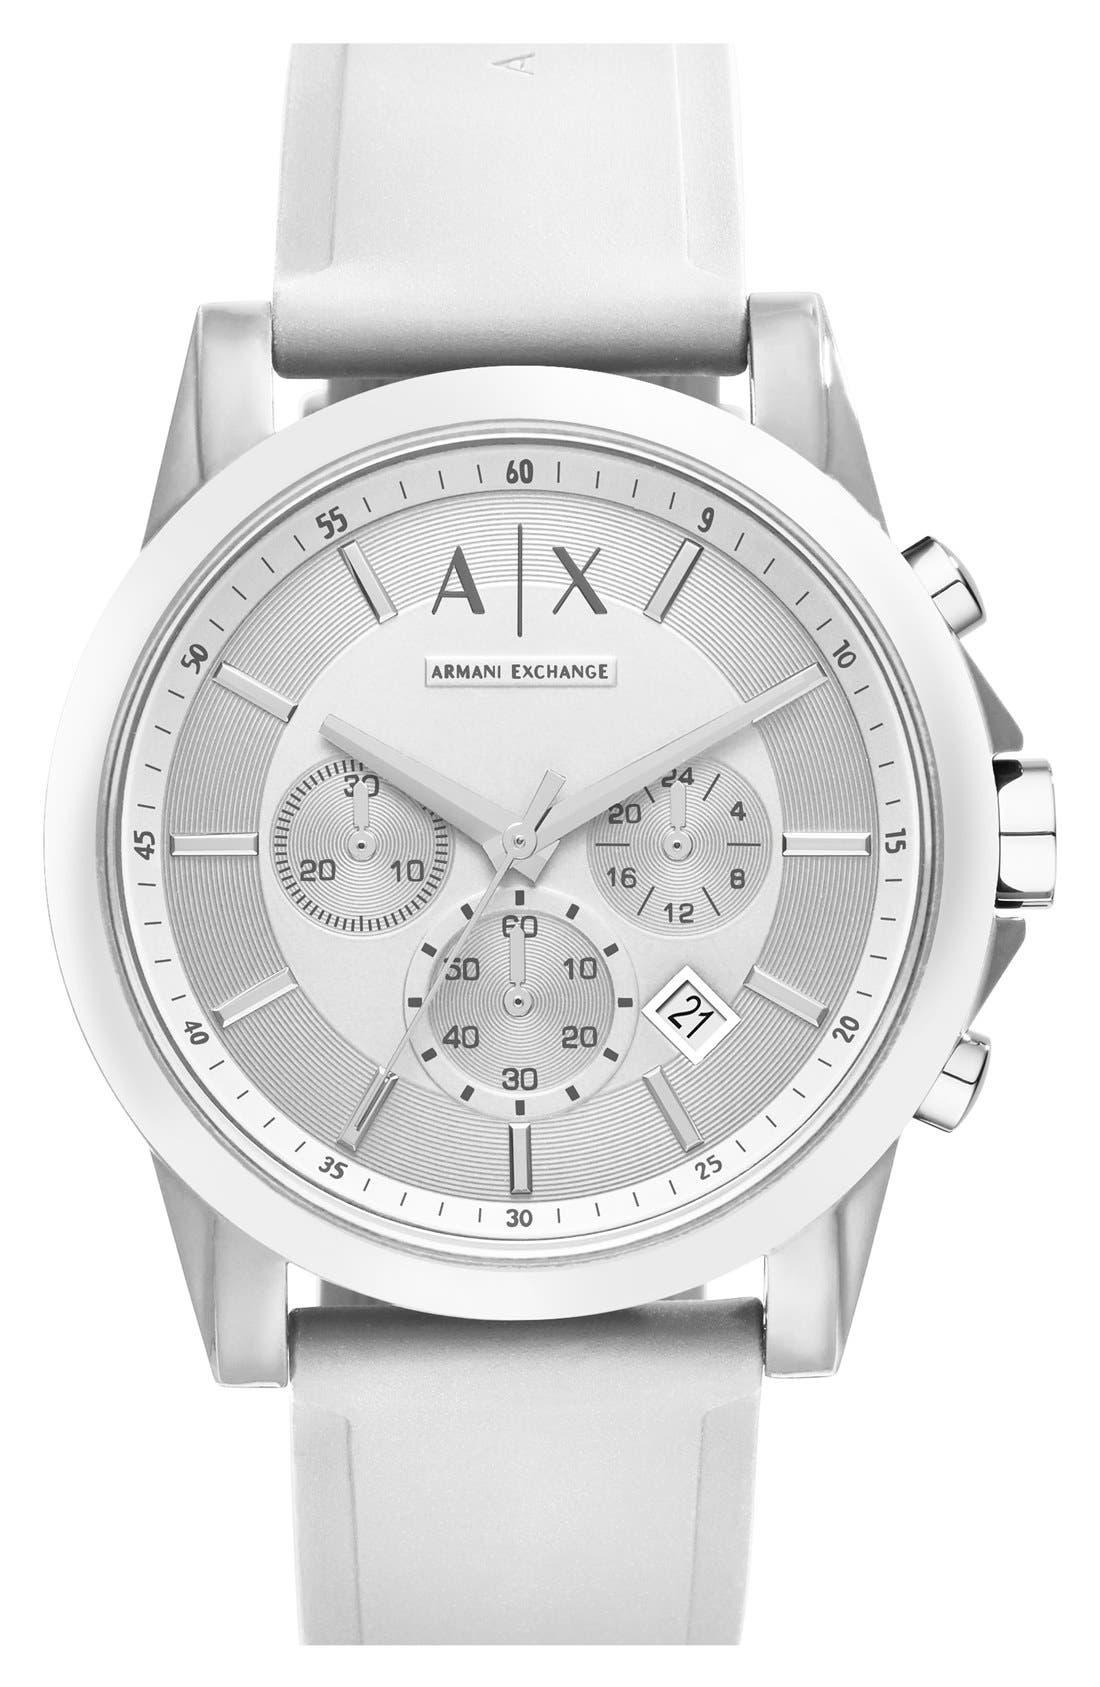 Main Image - AX Armani Exchange Chronograph Silicone Strap Watch, 44mm